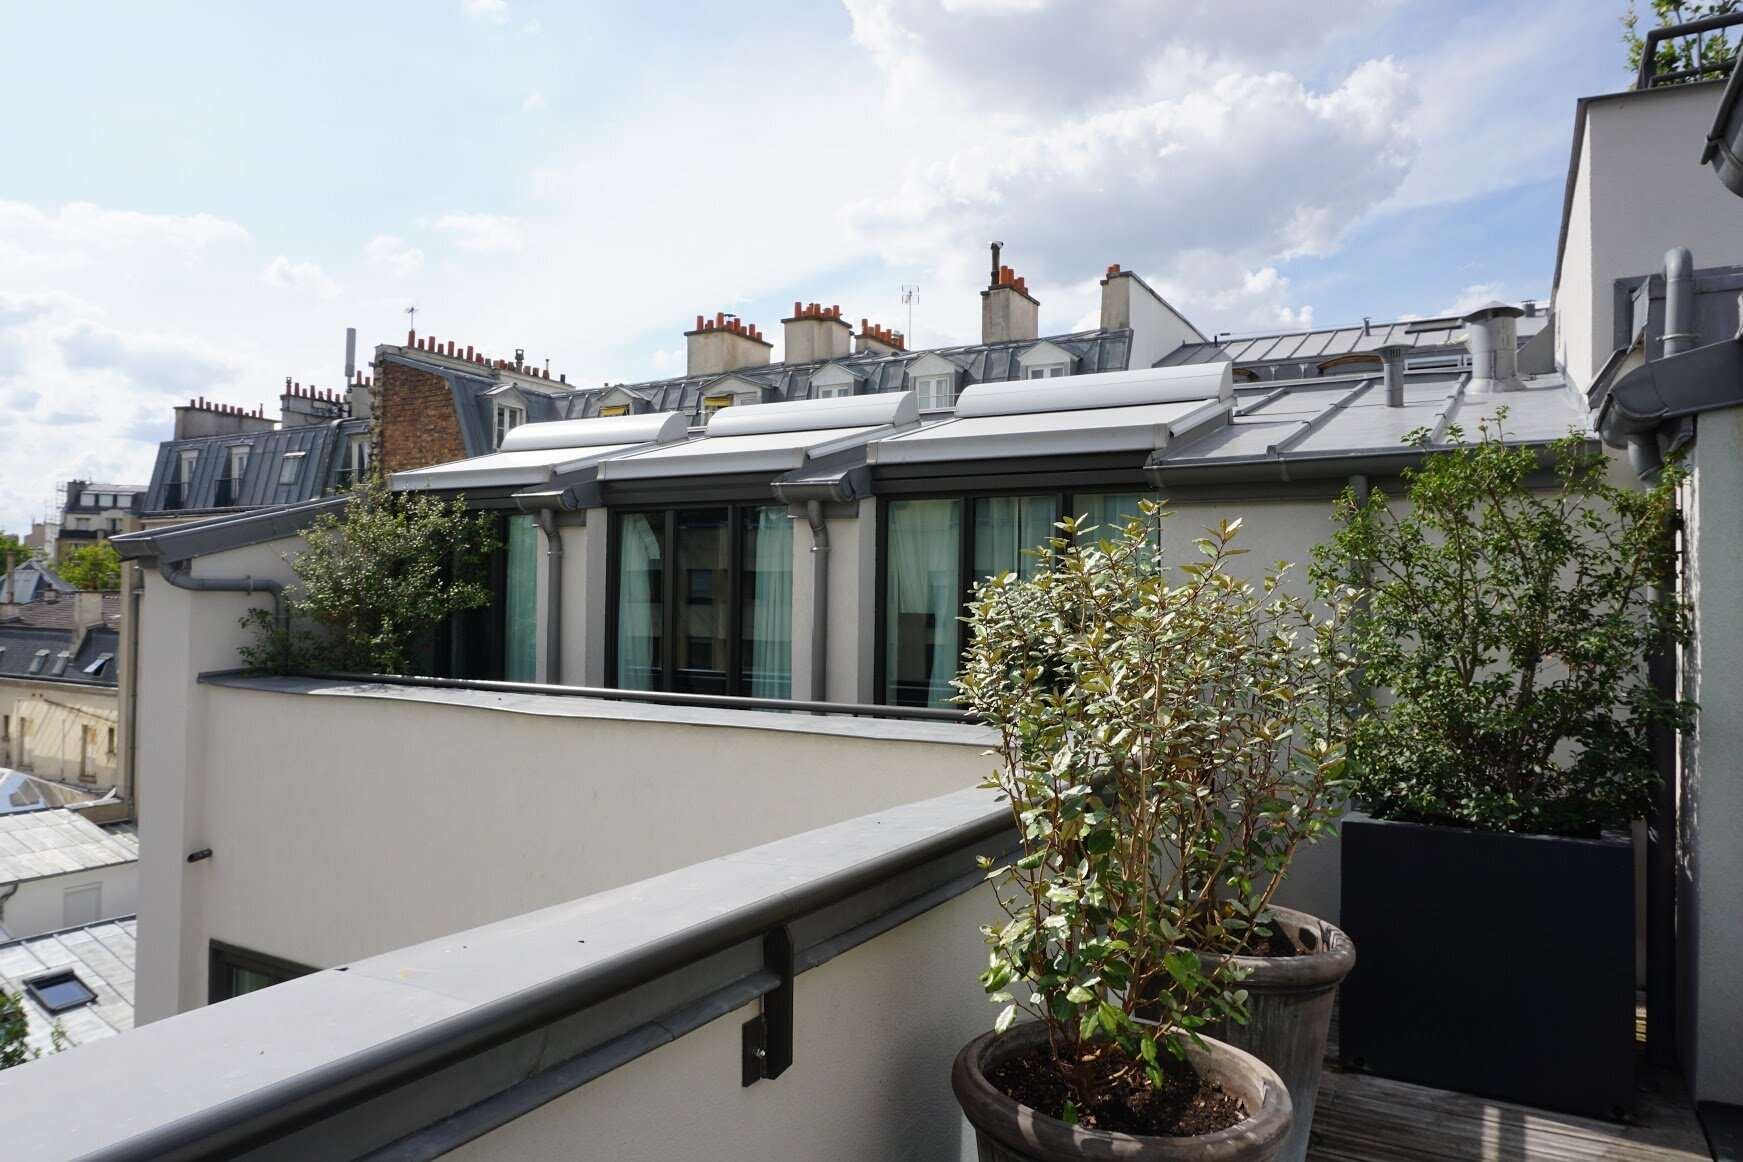 Balcony Maison Breguet Hotel Paris